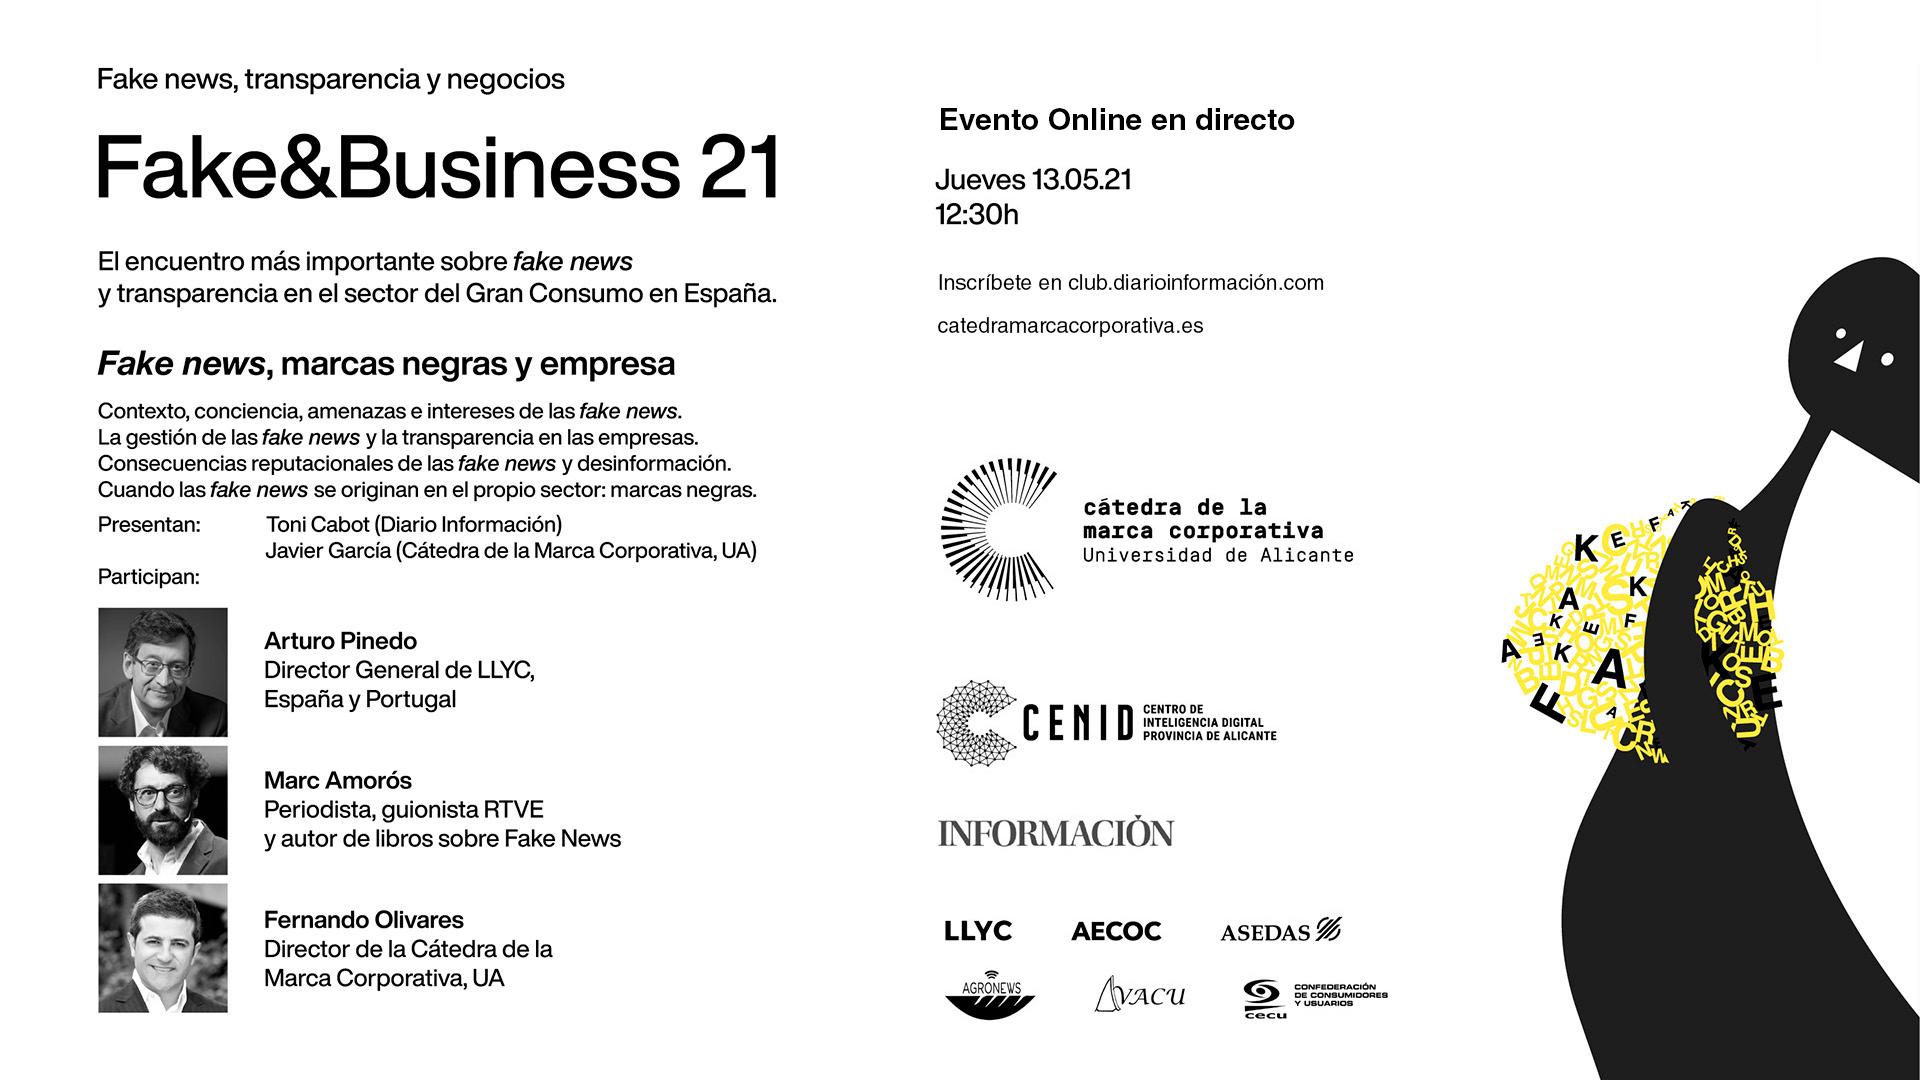 FAKE&BUSINESS 21 – Fake news, transparencia y negocios